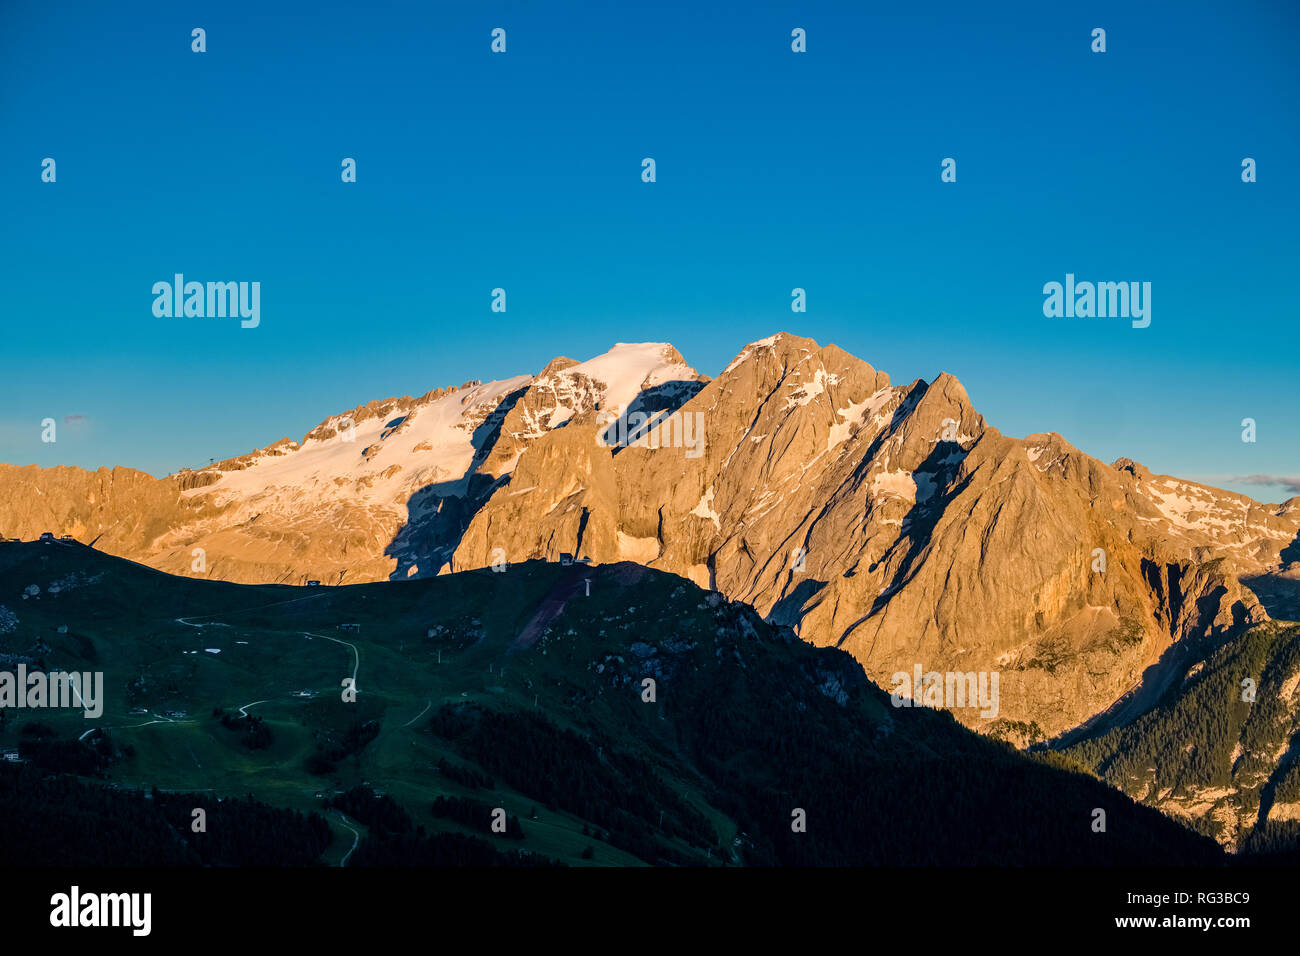 View on the pass Pordoi Pass, Passo Pordoi and the mountain Marmolada from Sella Pass, Sellajoch, Passo Sella at sunset - Stock Image